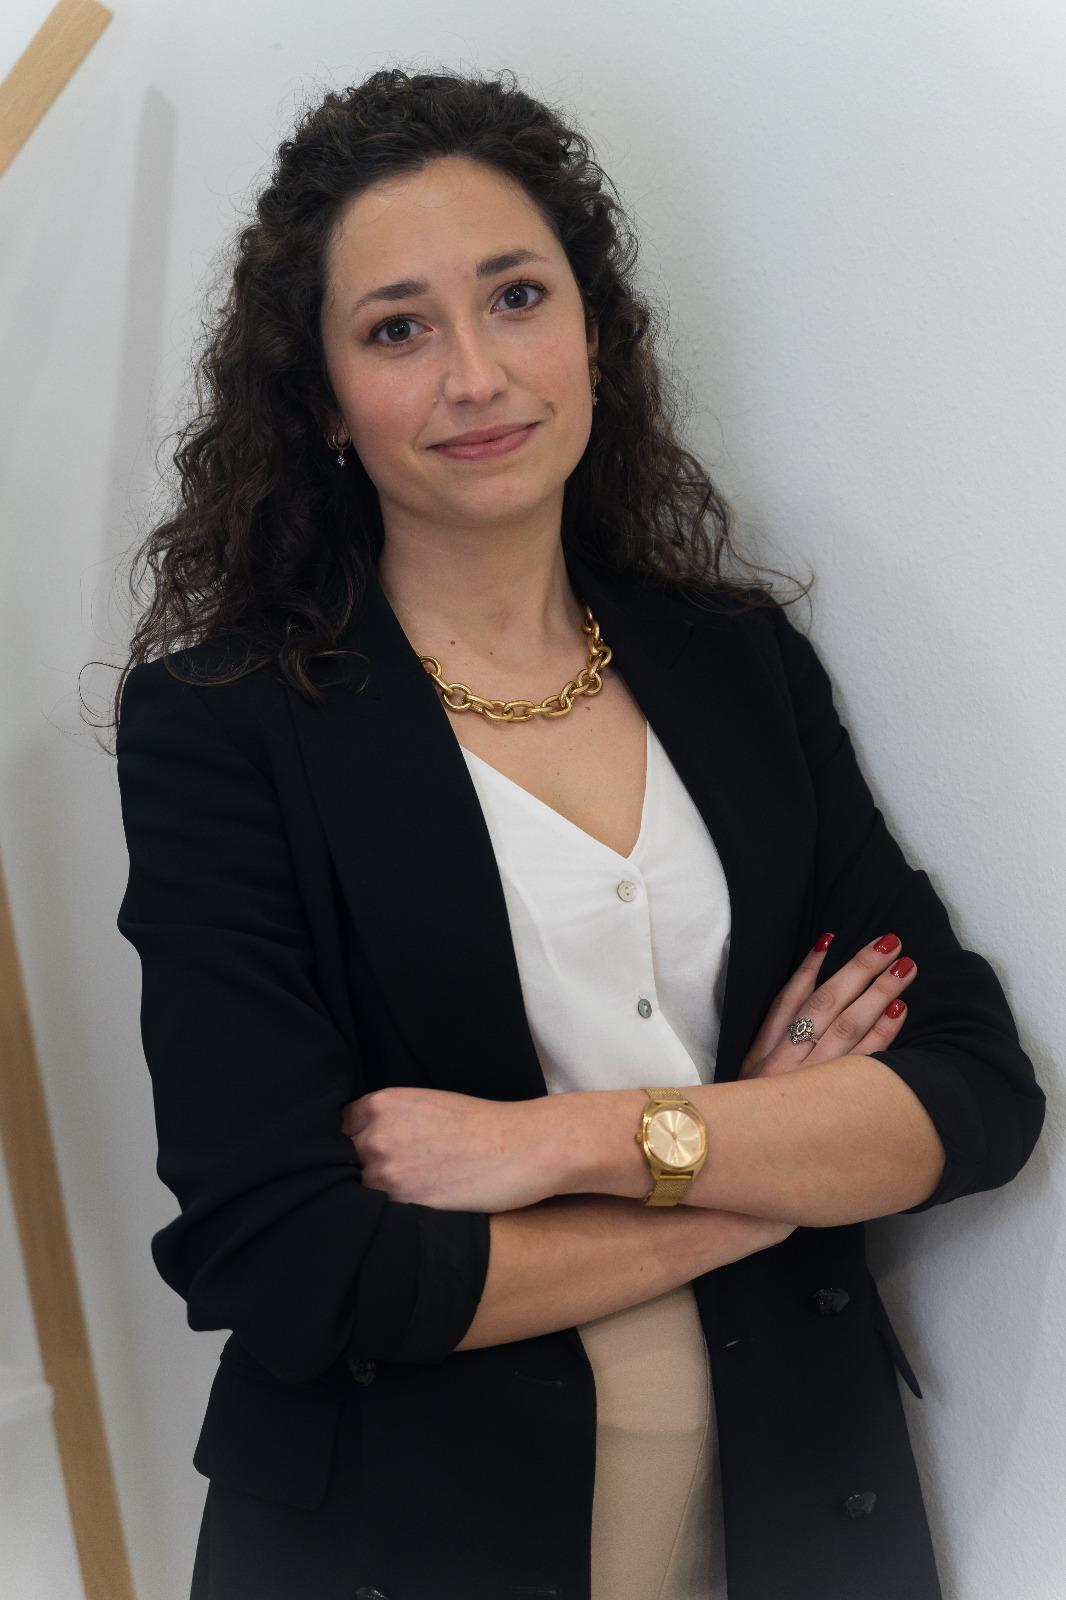 Ana Domínguez Pereira